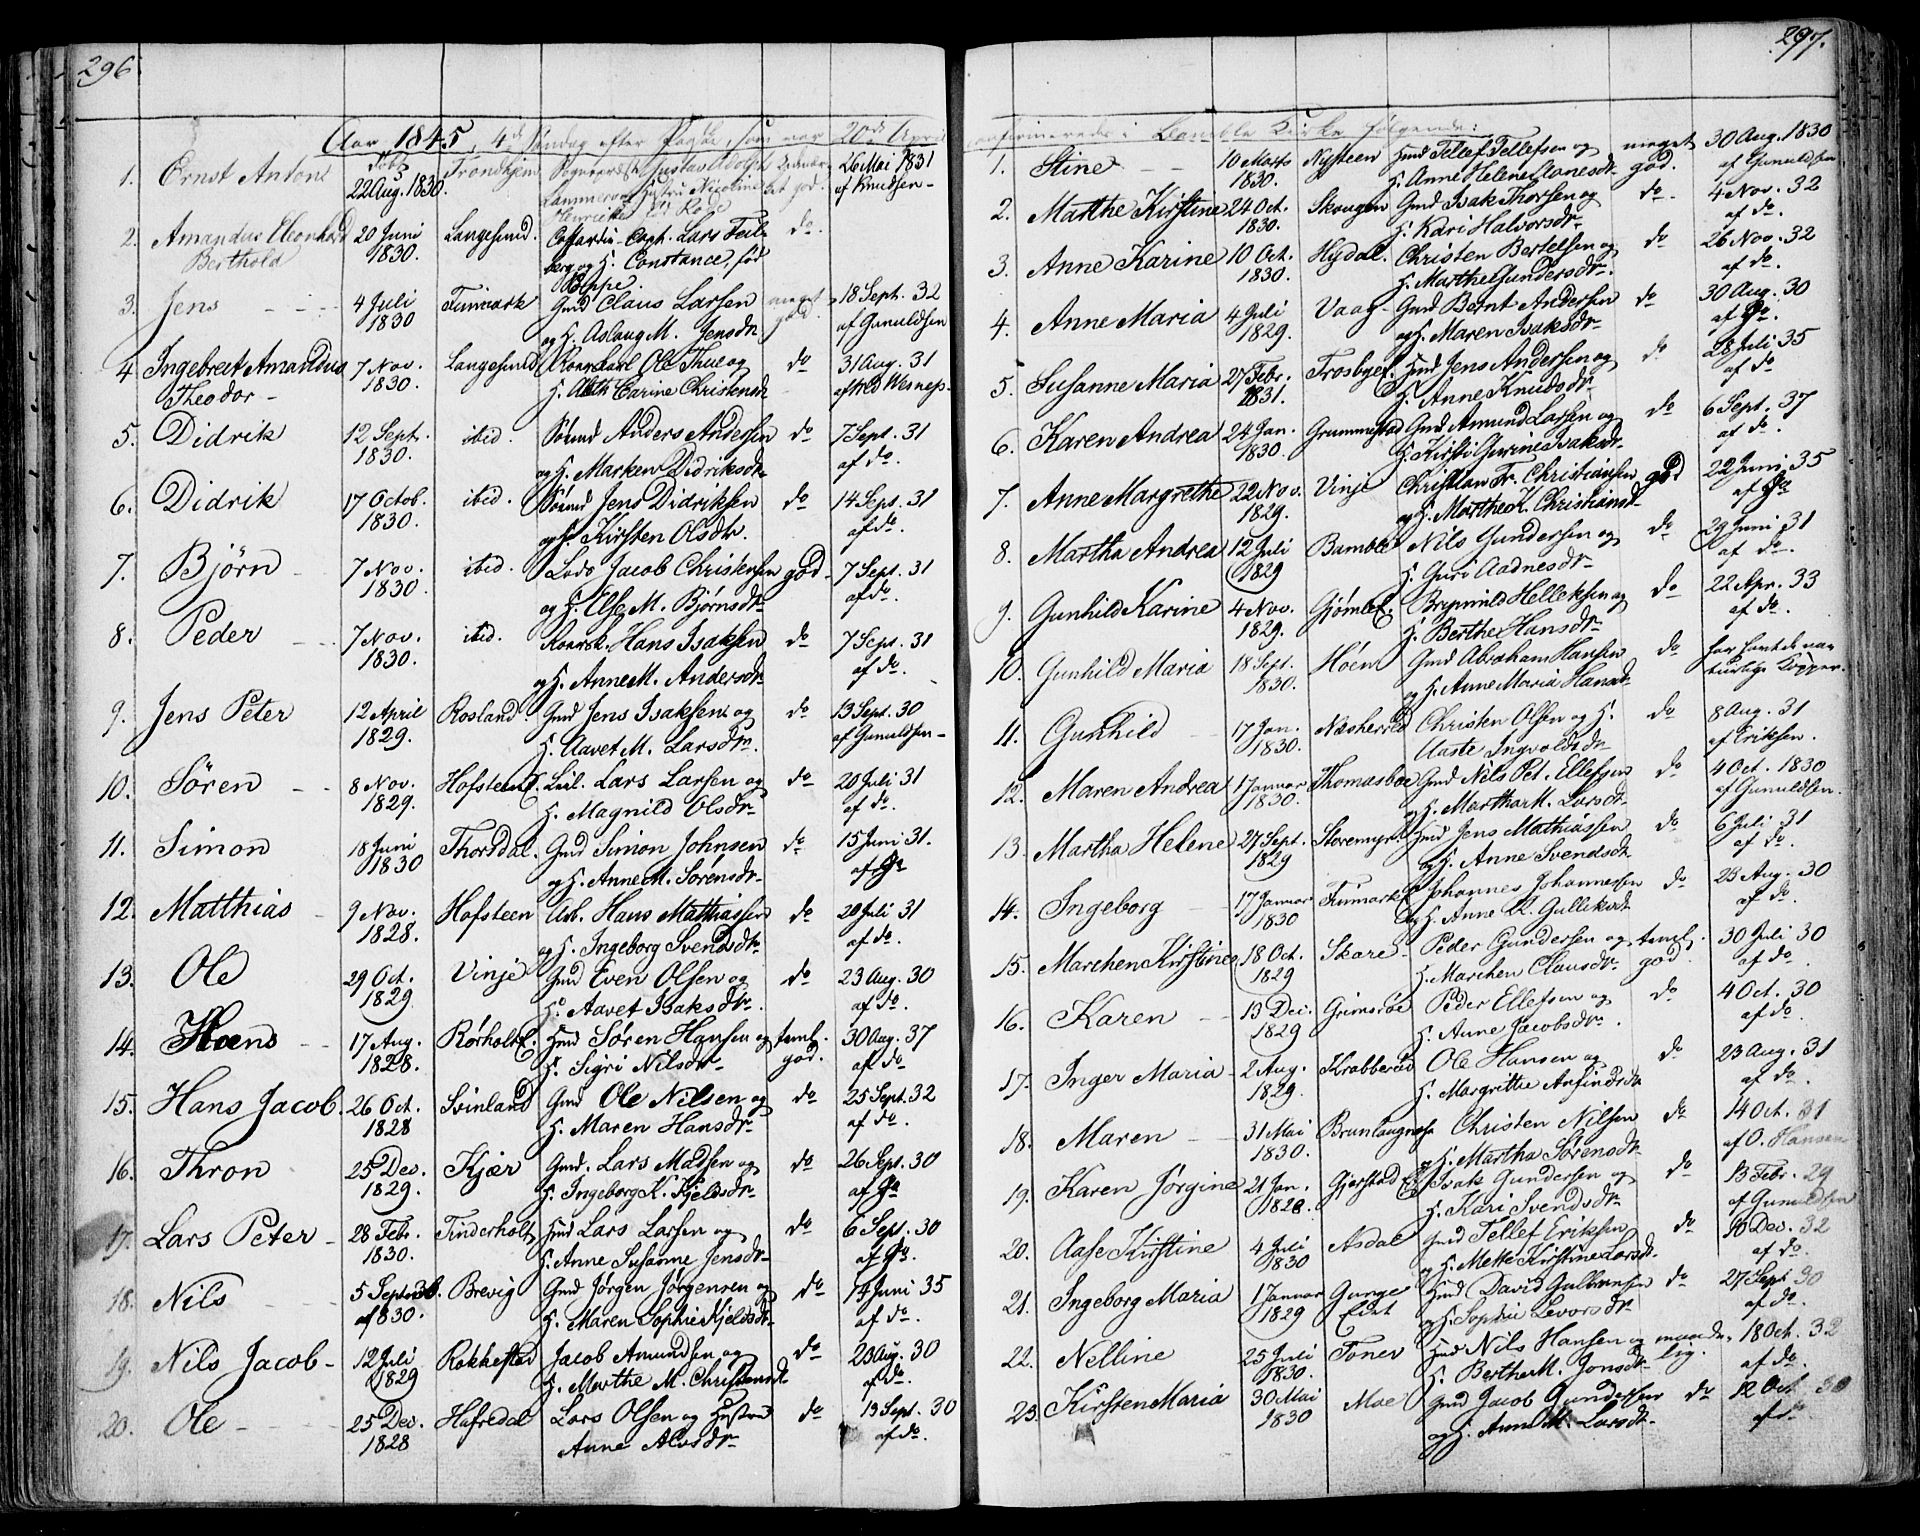 SAKO, Bamble kirkebøker, F/Fa/L0004: Ministerialbok nr. I 4, 1834-1853, s. 296-297